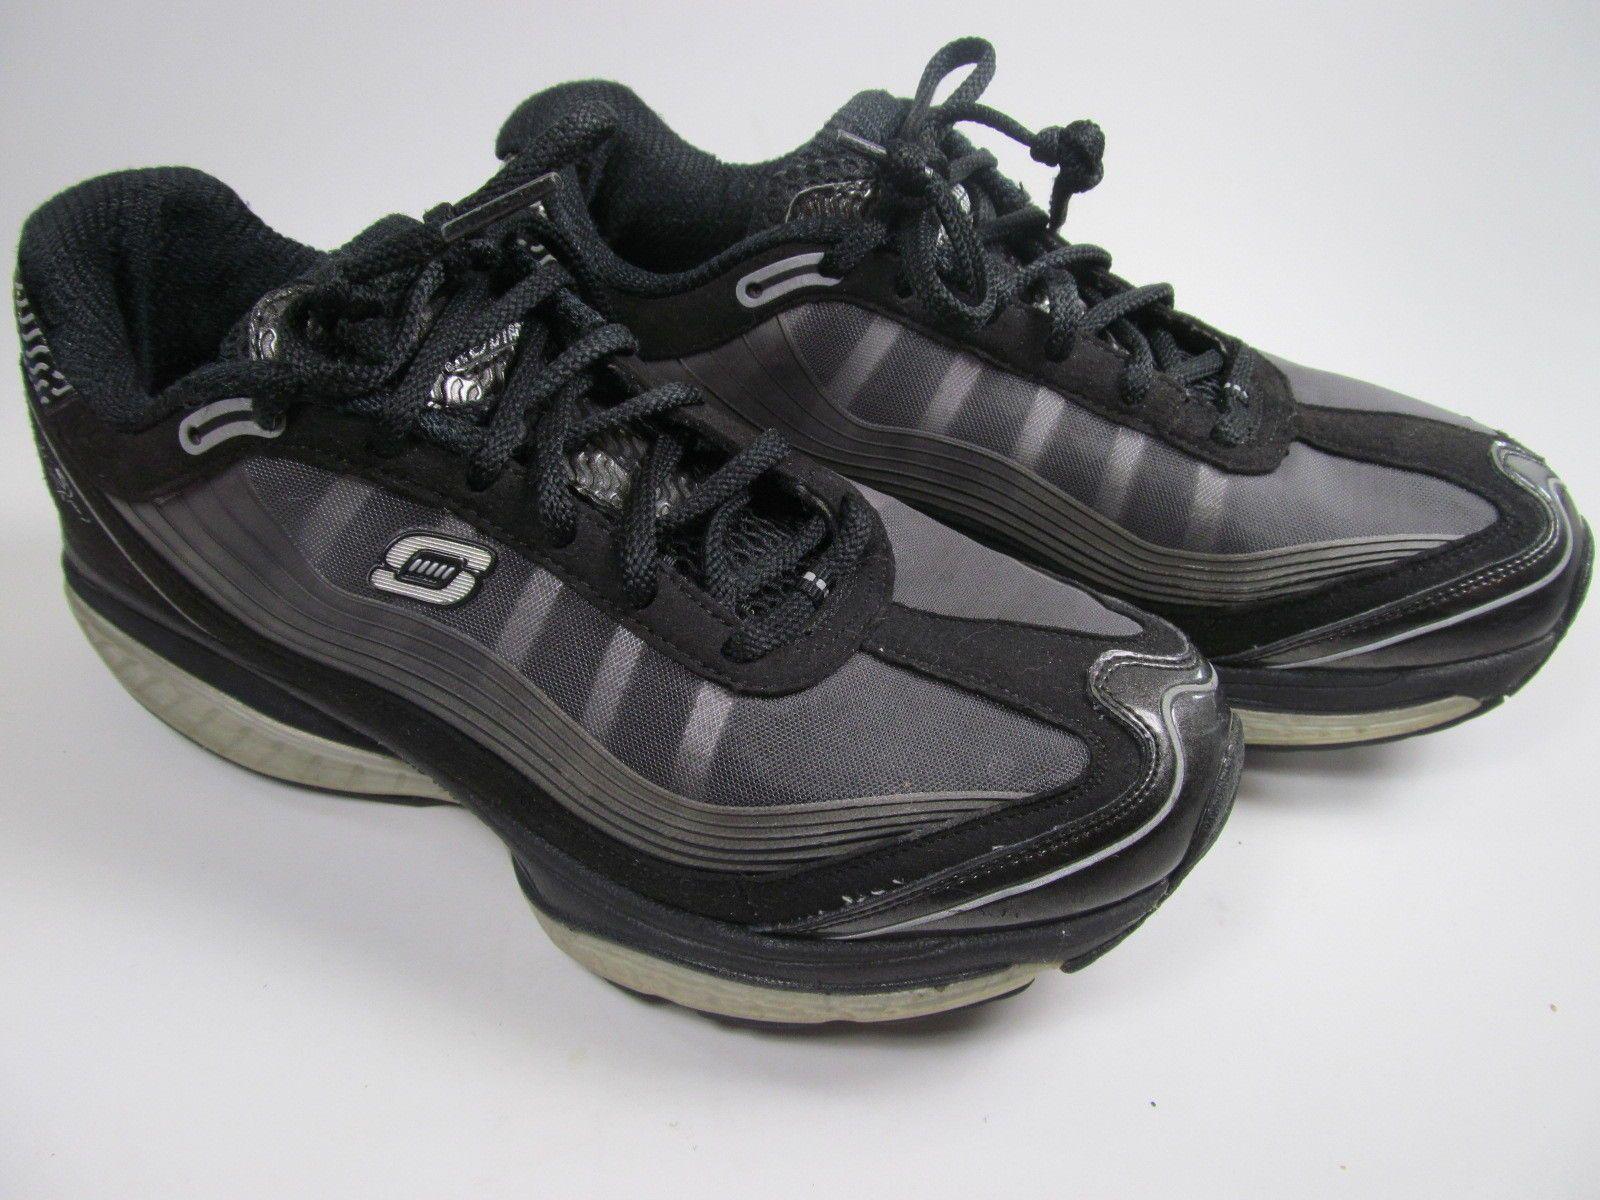 Skechers Shape-Ups Resistance Black Silver Walking Running Shoes Sizes 8